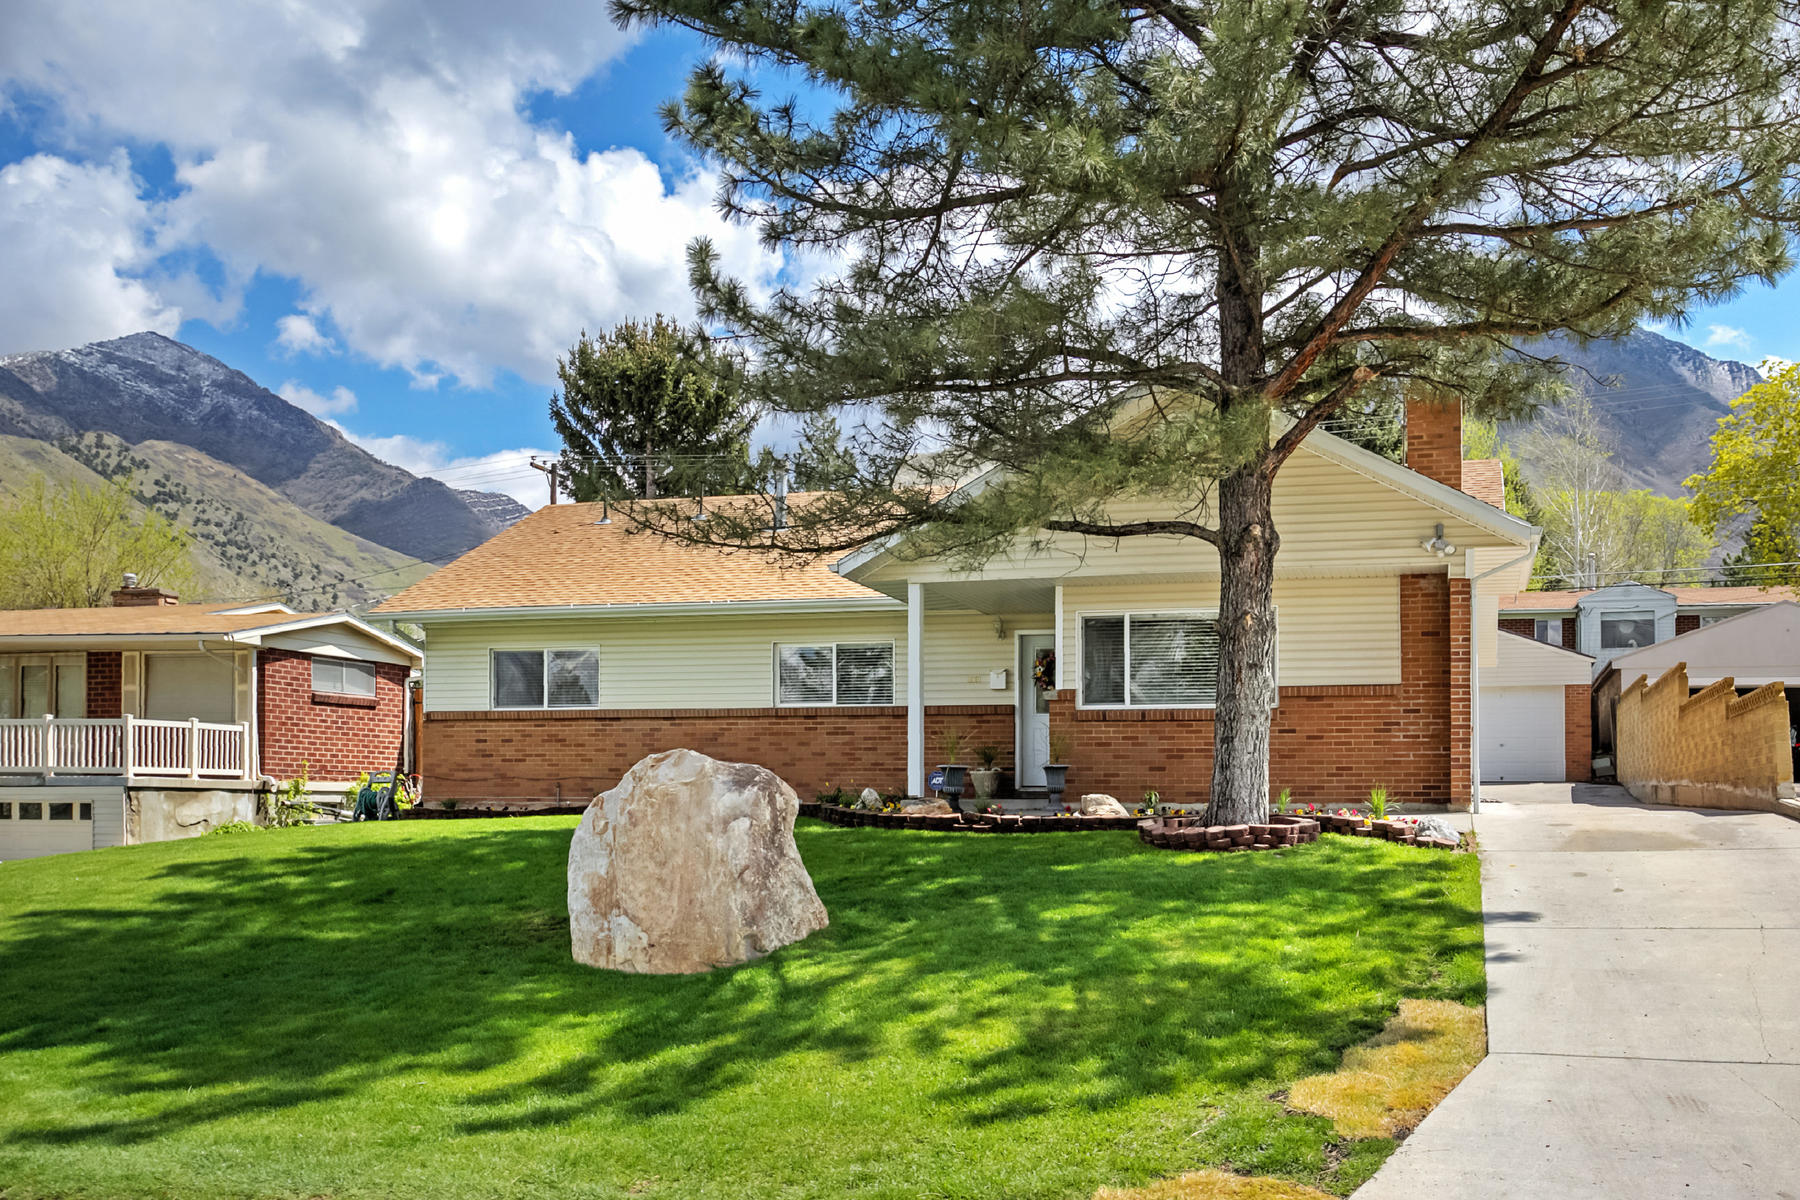 独户住宅 为 销售 在 Rare Olympus Cove 6 Bedroom Rambler 4081 S Achilles Dr 盐湖城市, 犹他州, 84124 美国